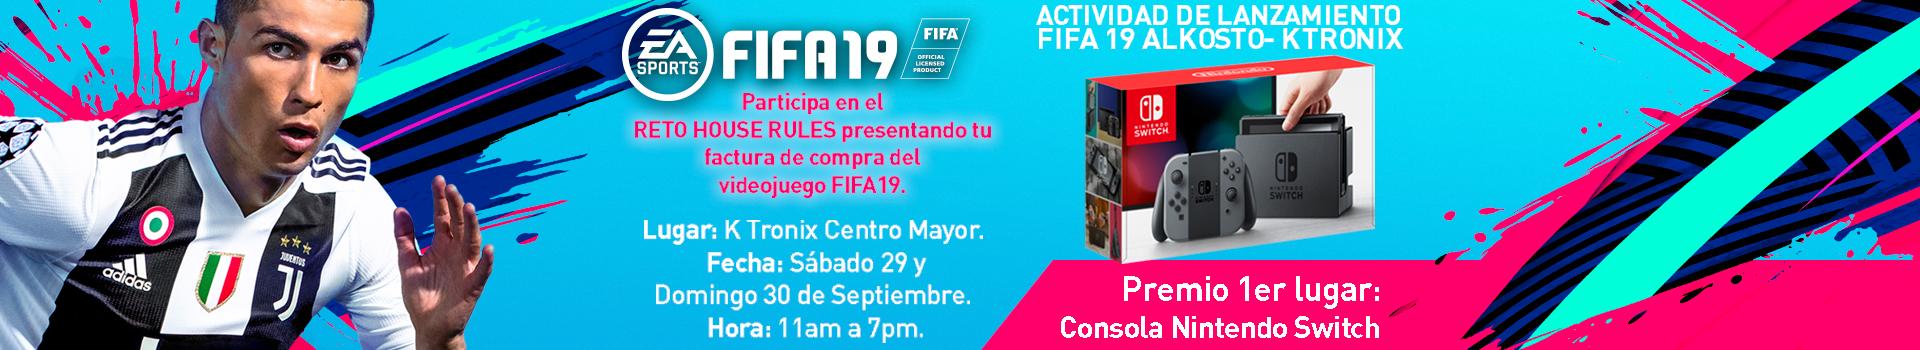 AK-KT-BCAT-18-videojuegos-PP---Todas-FIFA19-sep29